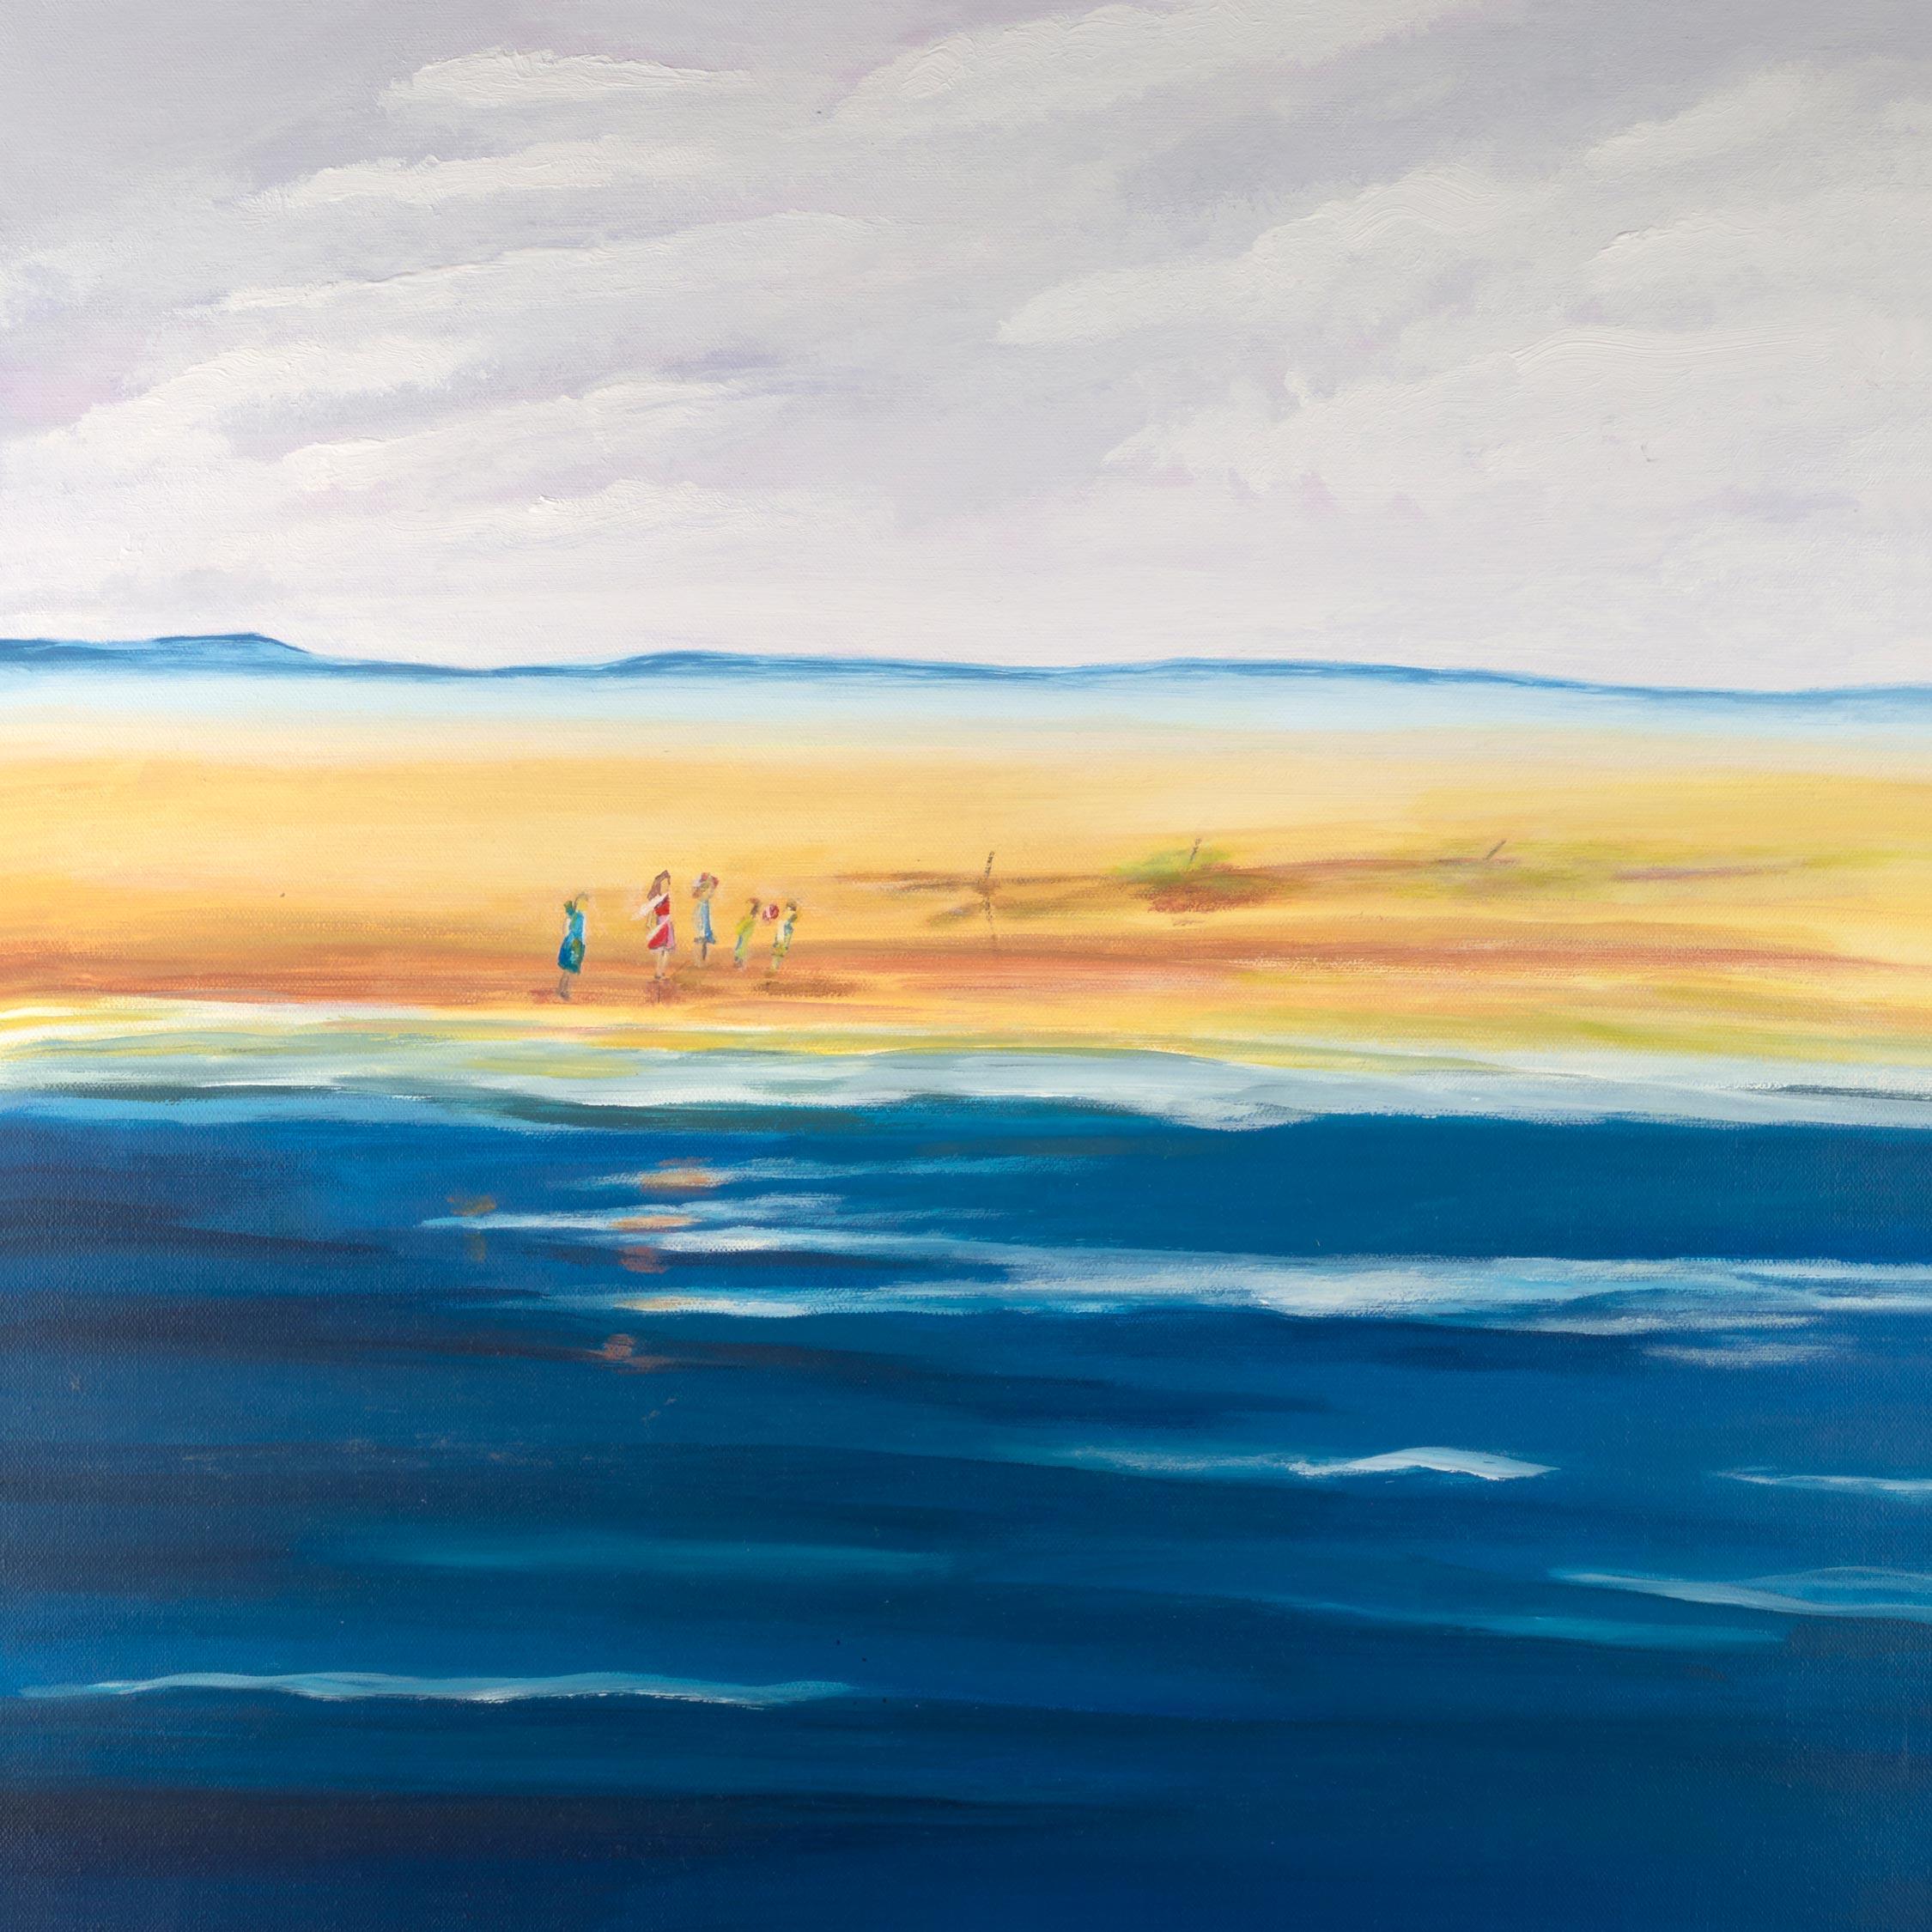 Ocean View by Bettina Stegemann